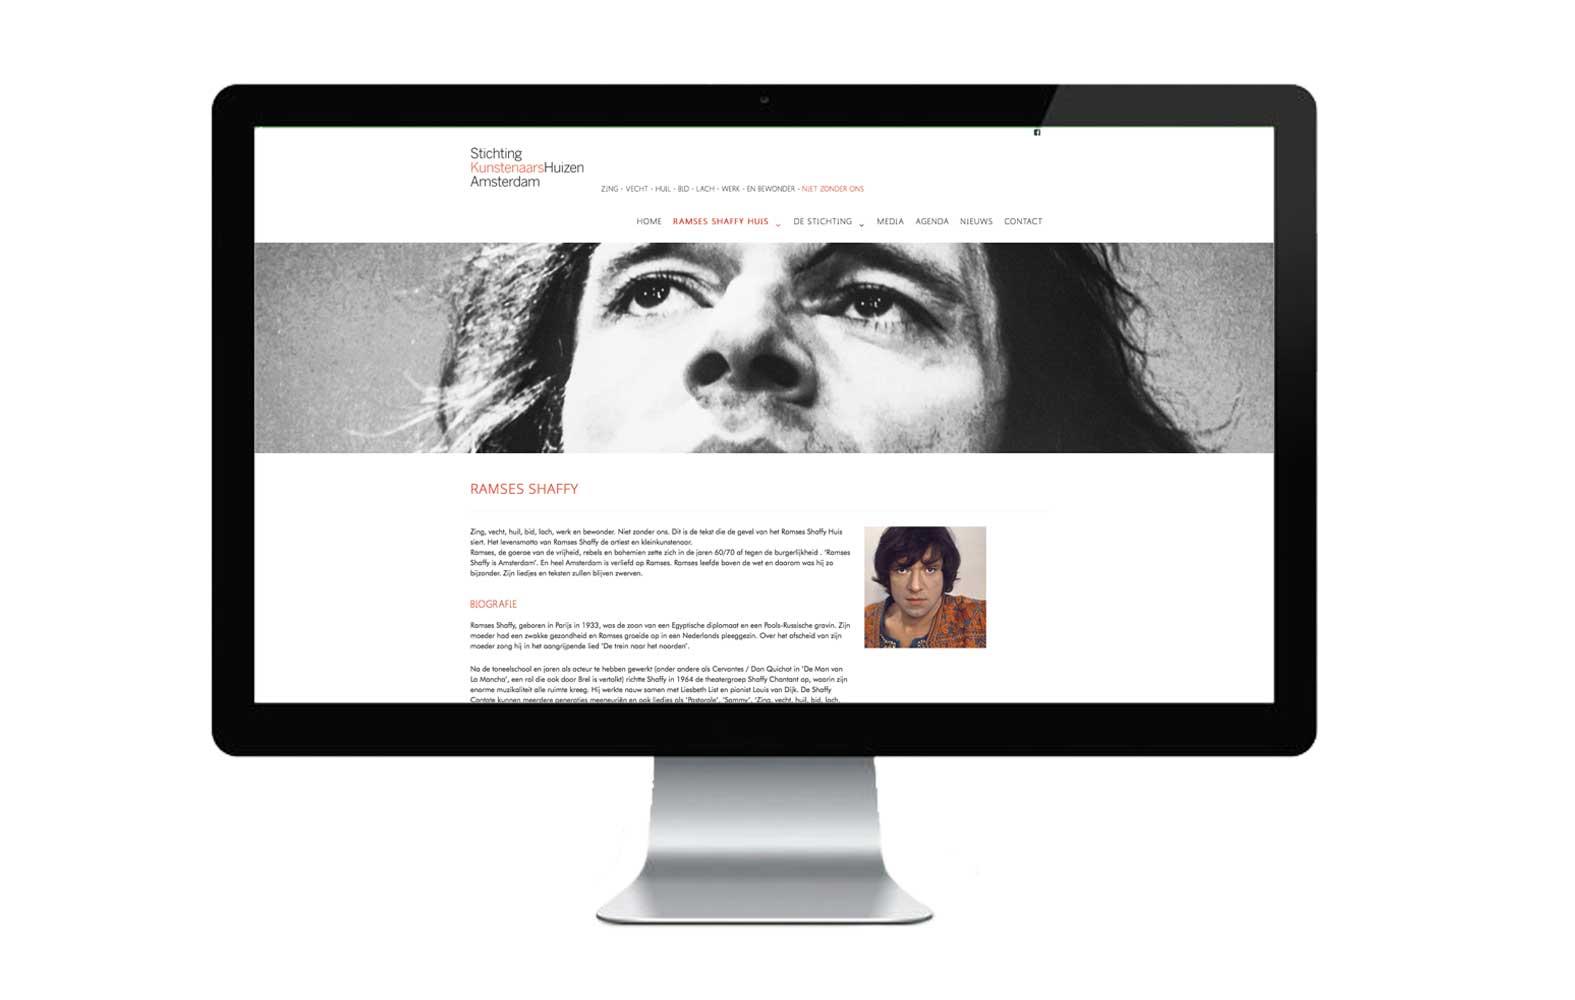 StudioErnst-KunstenaarshuizenAmsterdam-RamsesShaffy-website